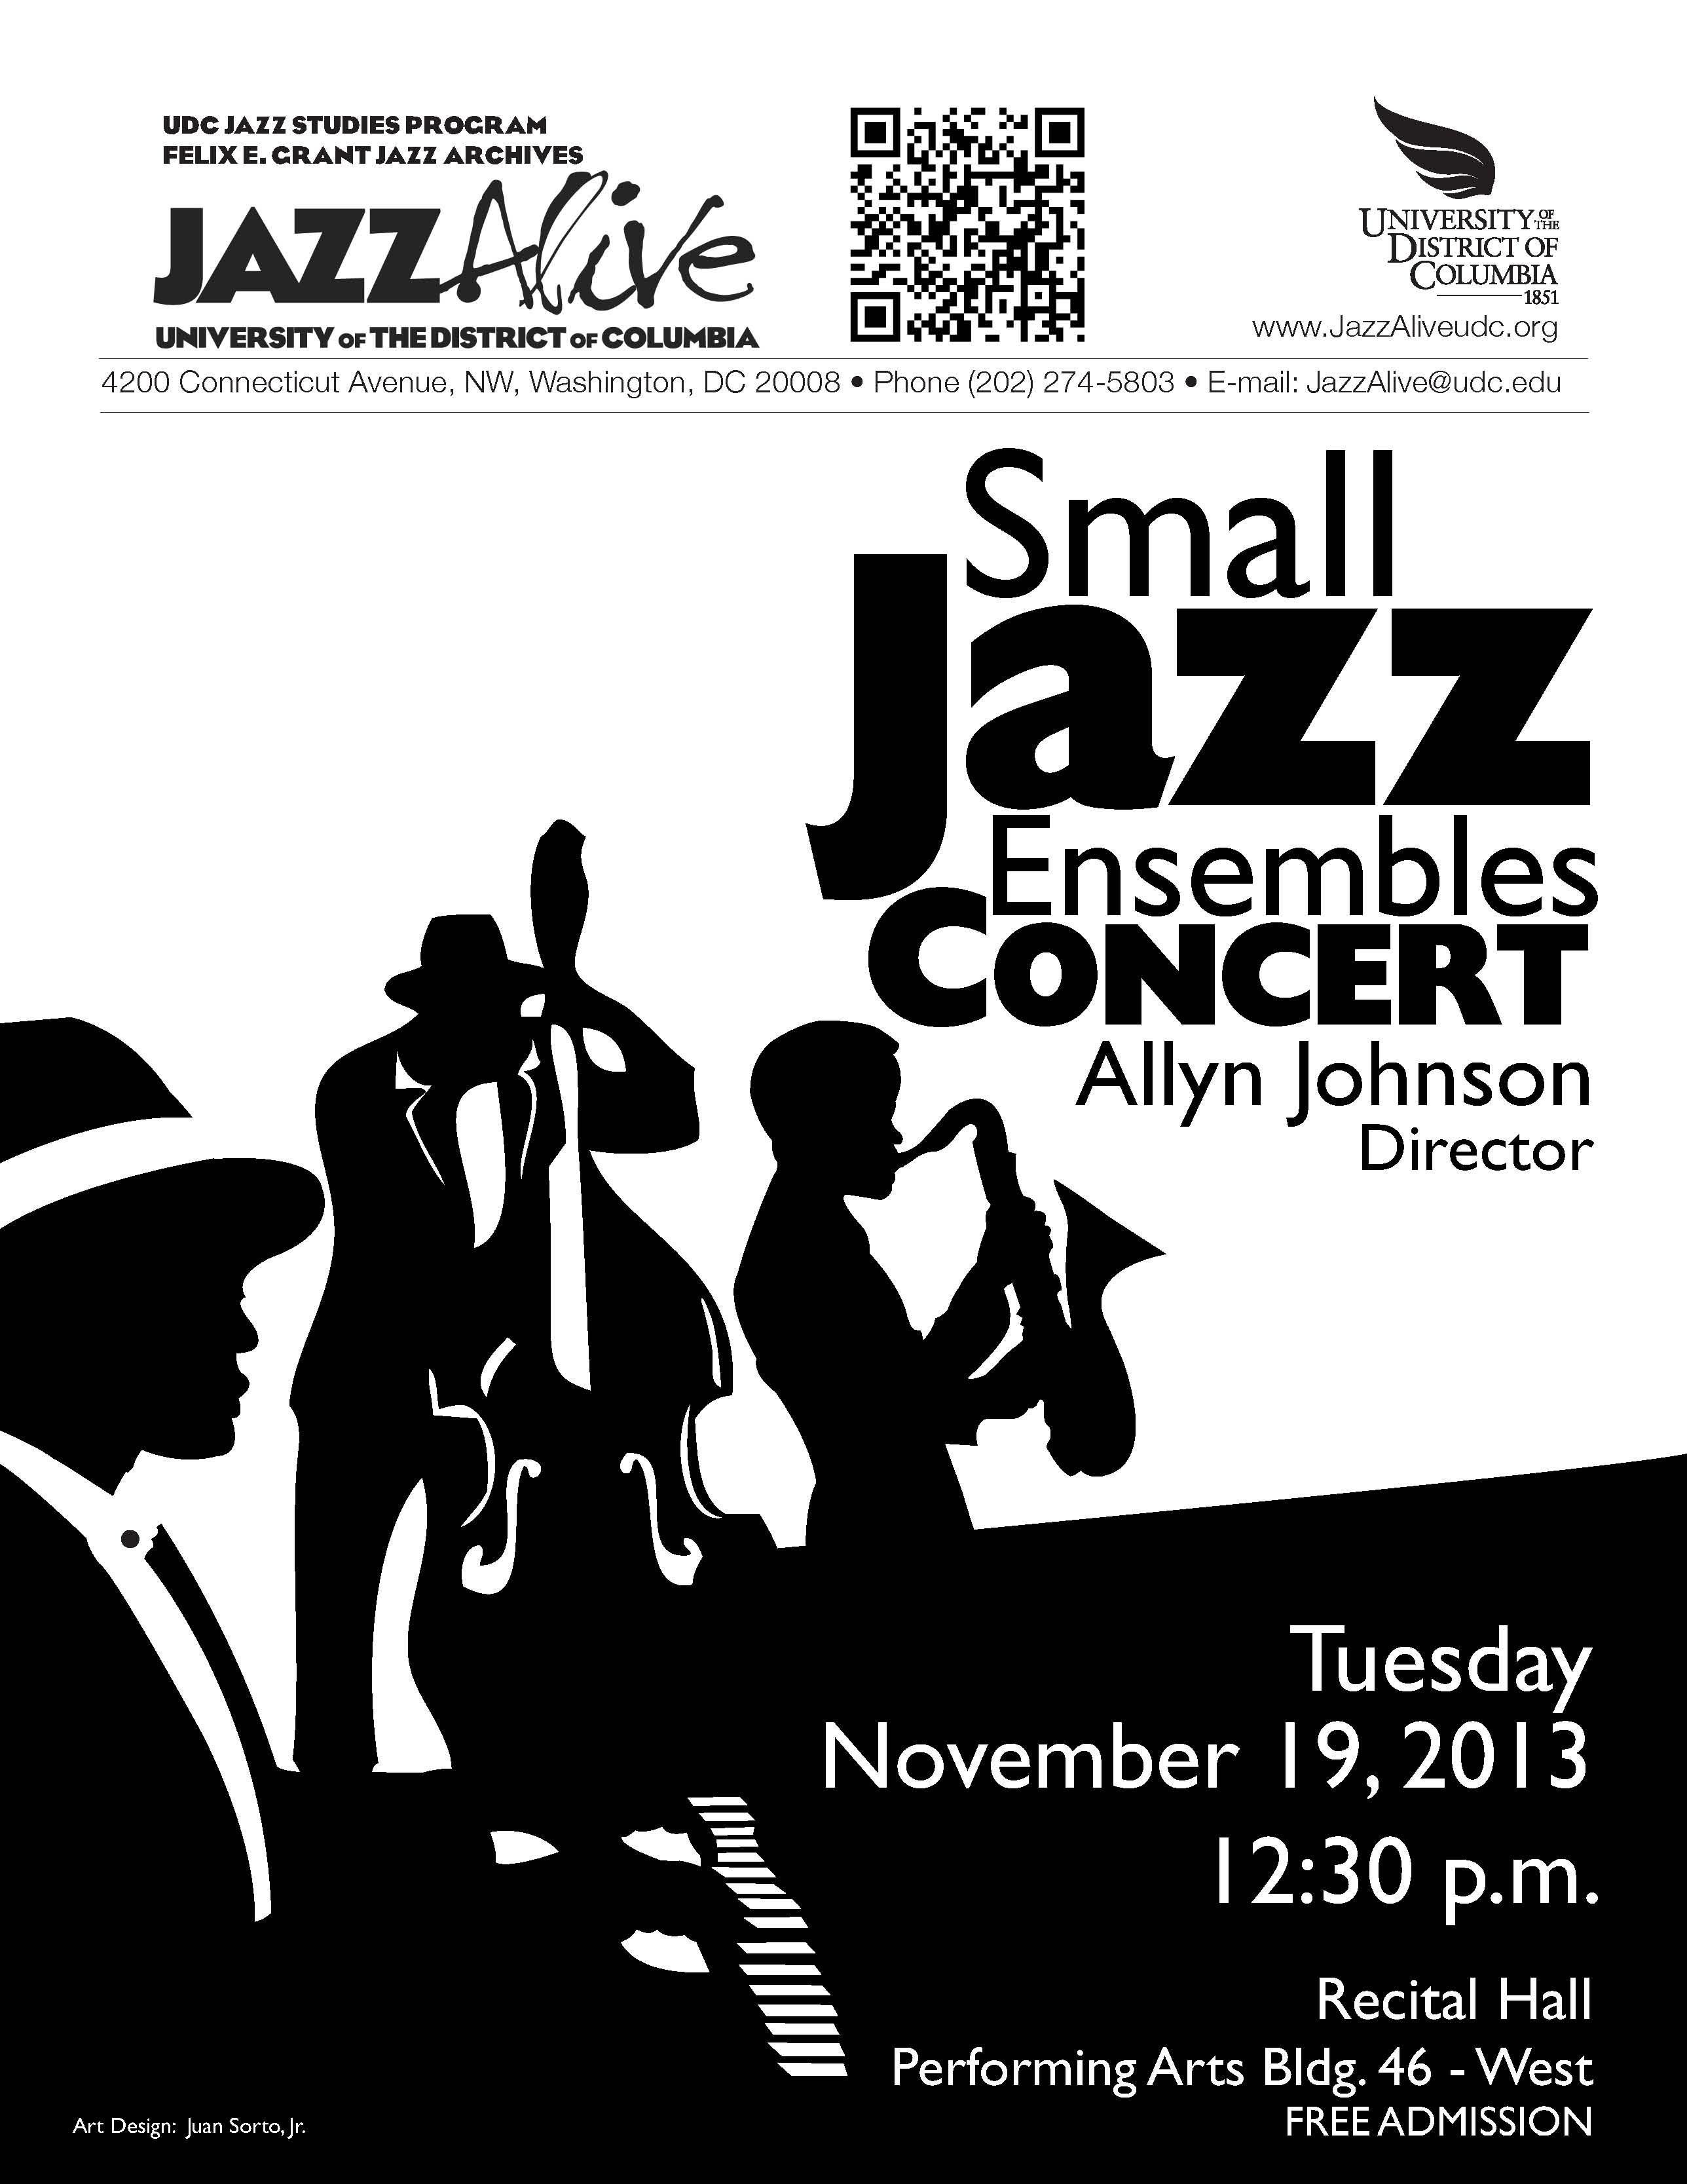 Udc small jazz ensembles concert, dir. allyn johnson